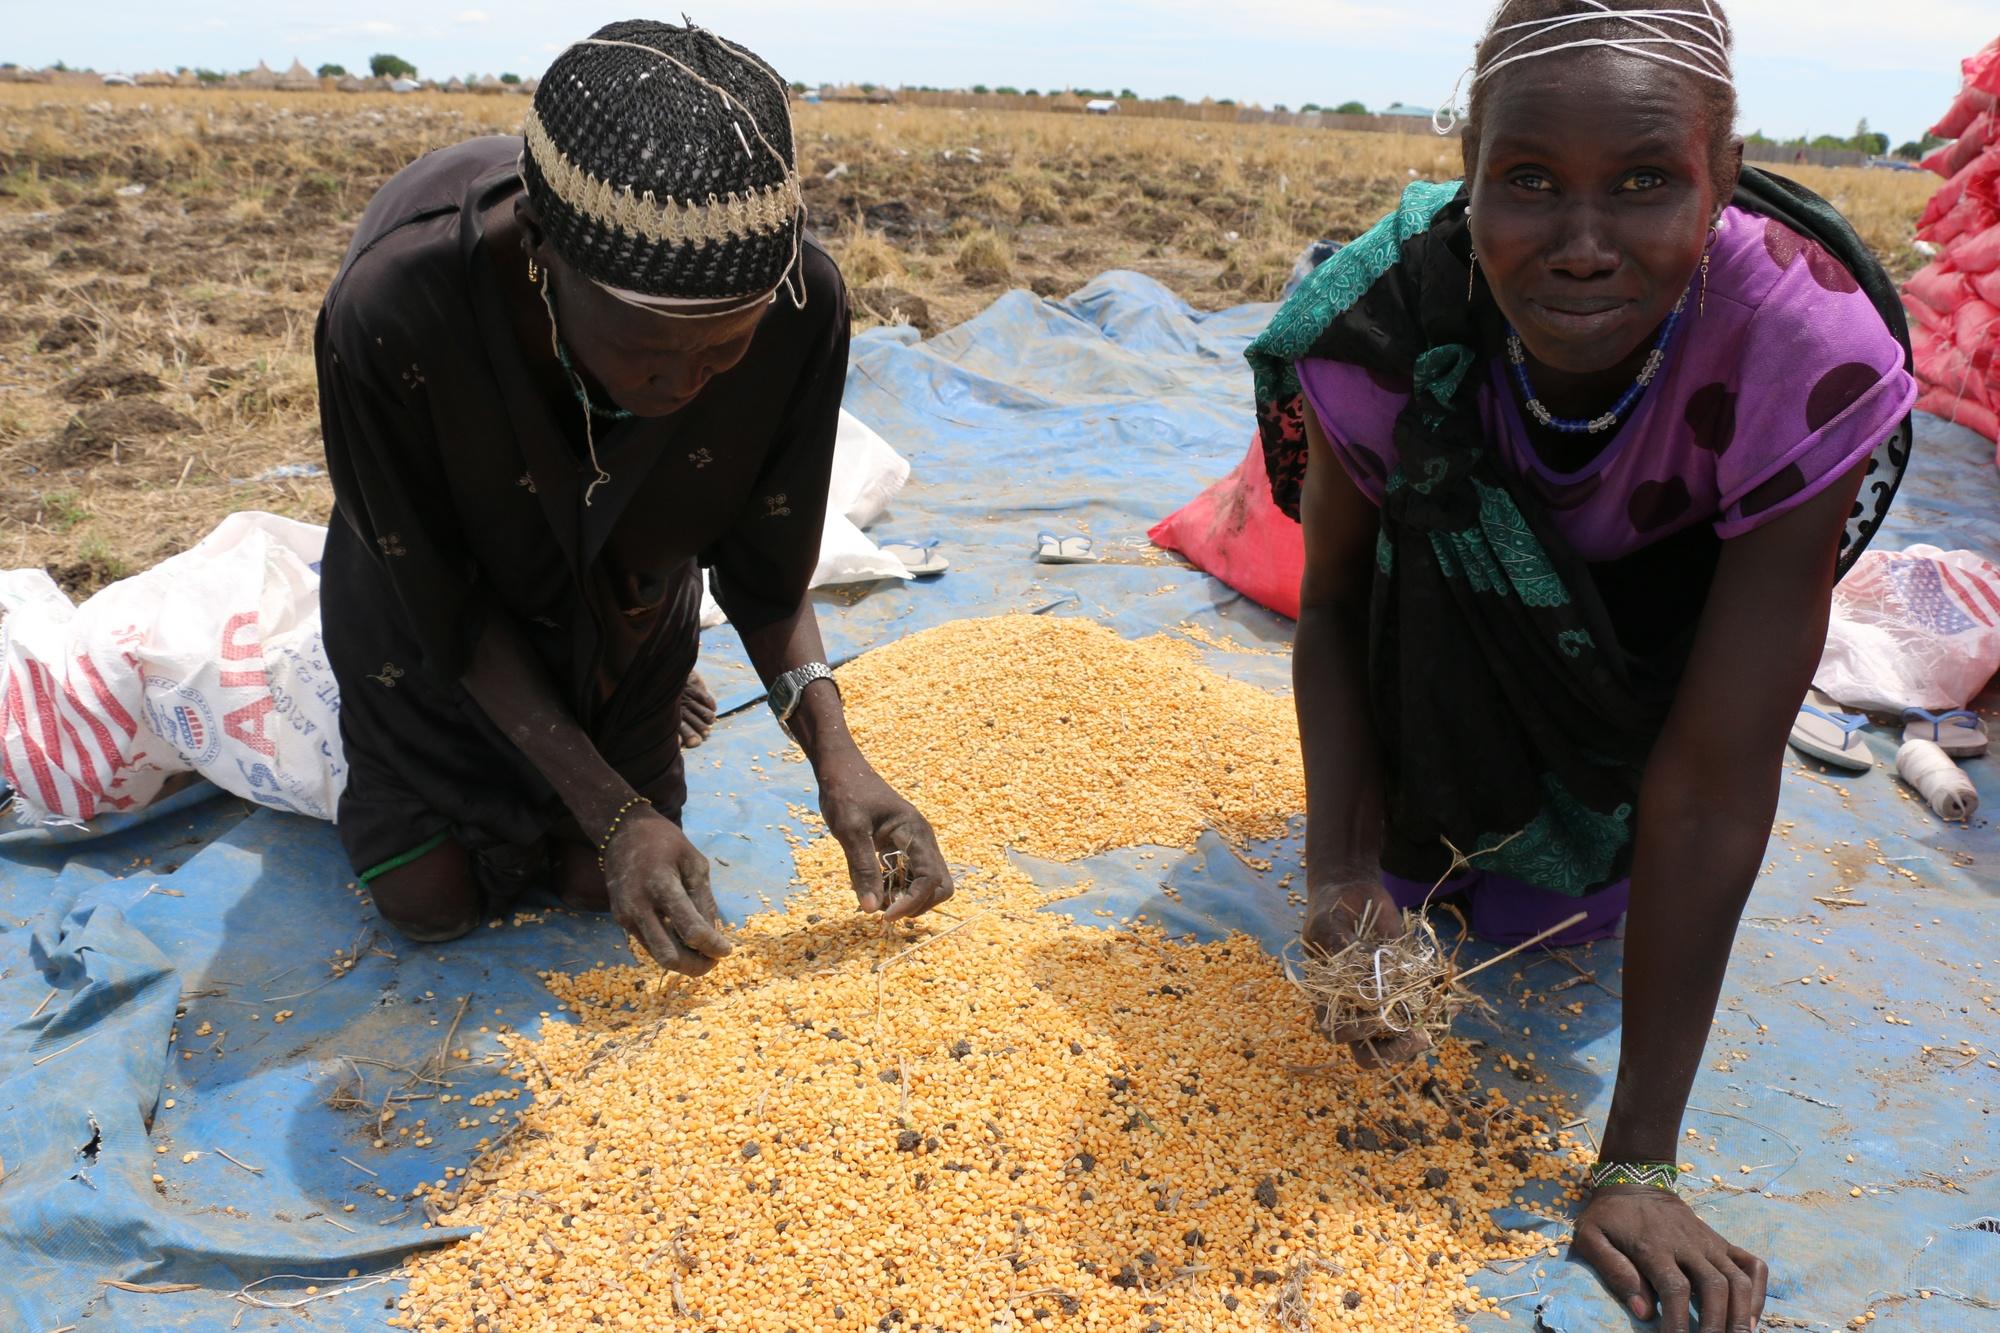 Two women sift through yellow split peas on a blue mat